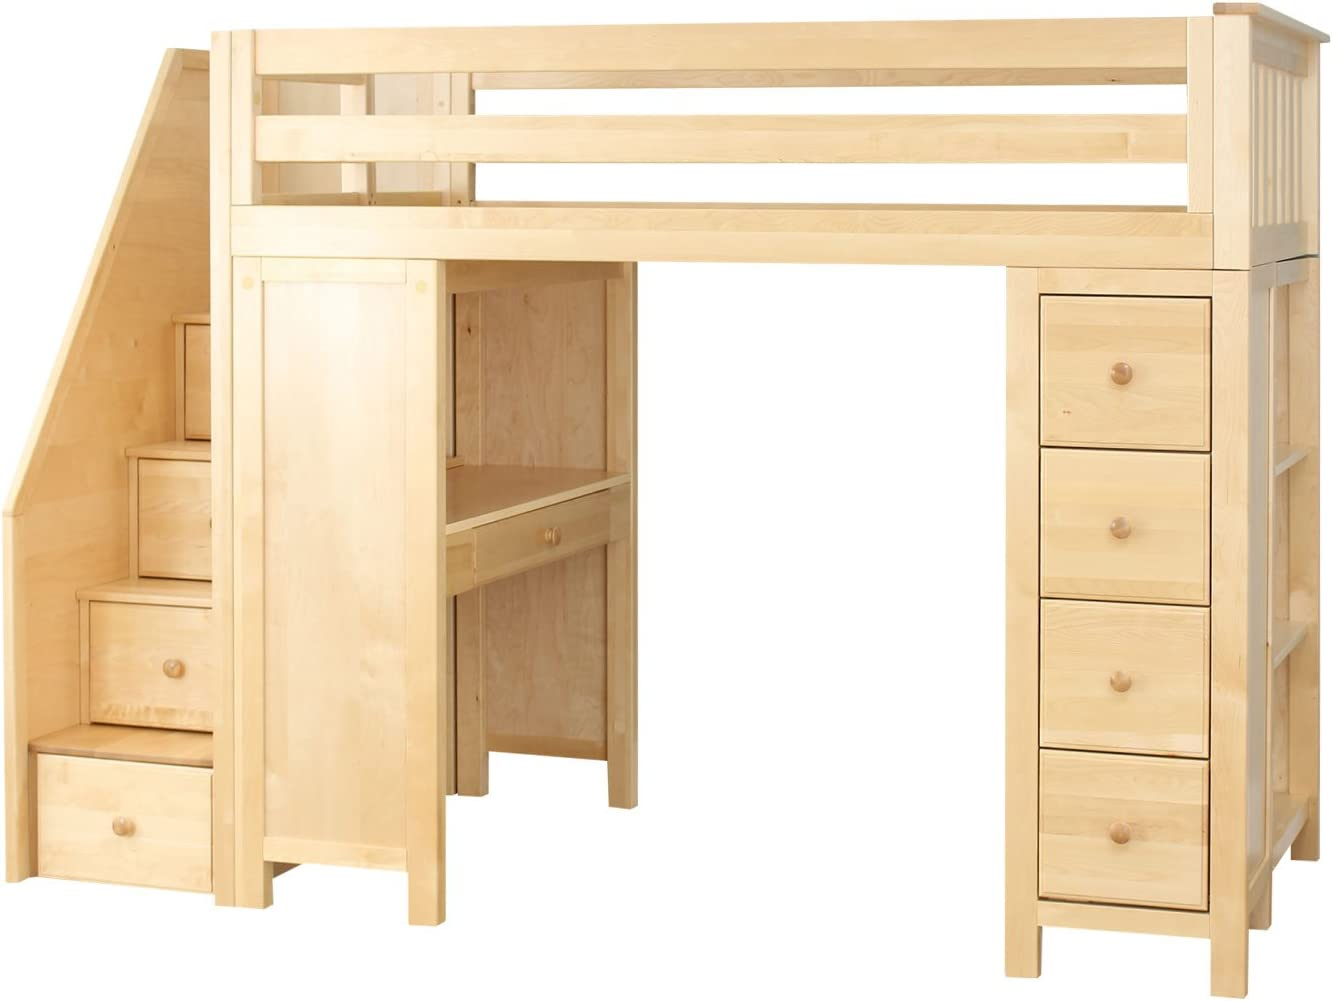 Amazon Com Plank Beam Staircase Combo Loft Bed Desk Dresser Natural Furniture Decor